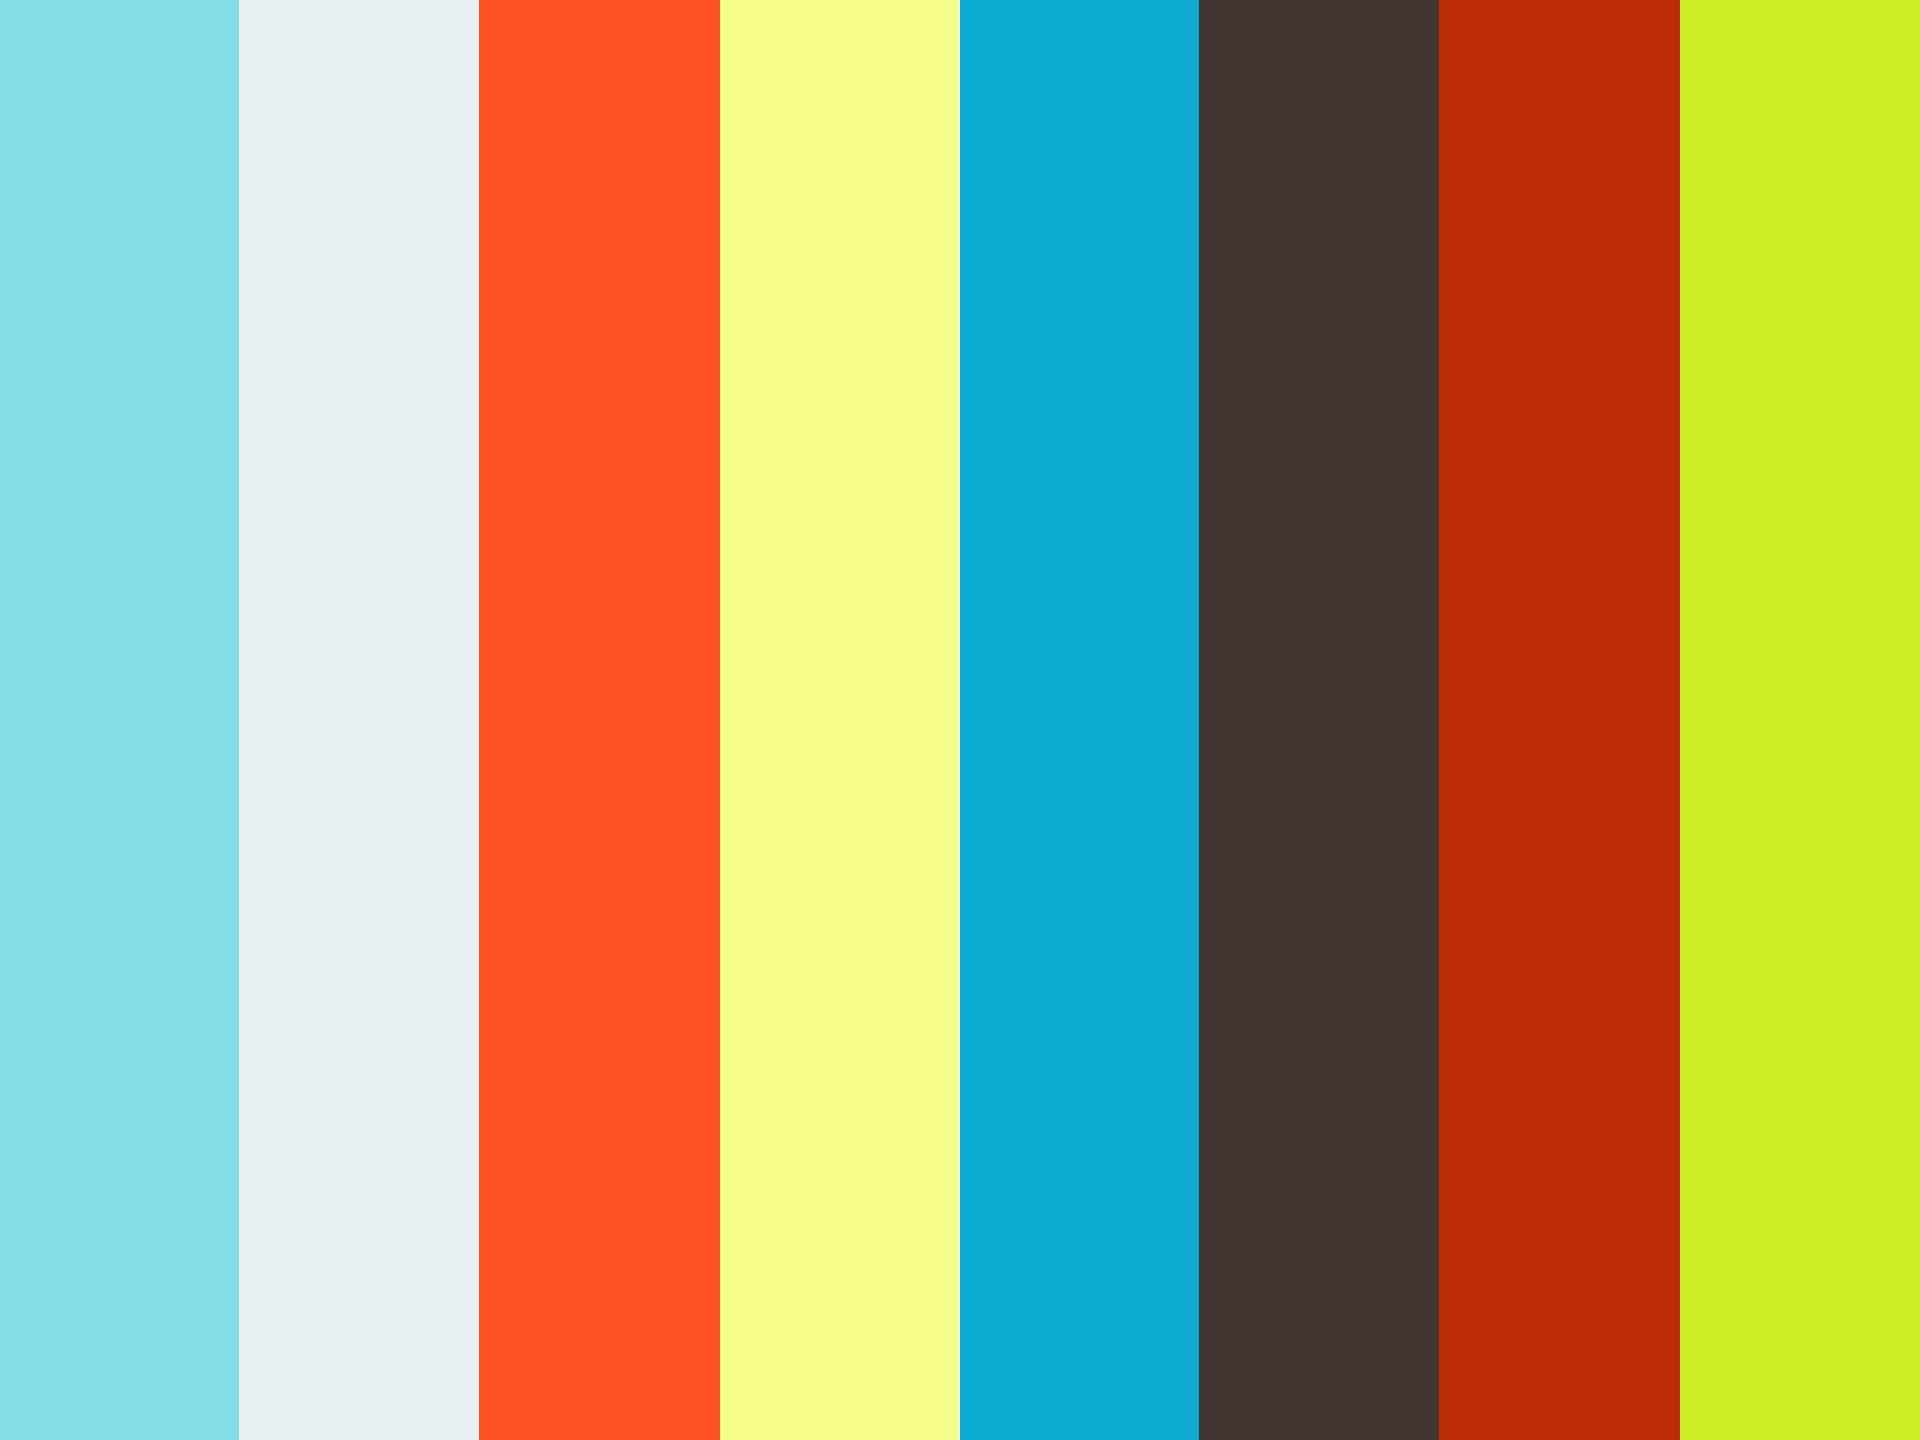 【special】内山徹哉先生:⑩クラウン修復の心臓であるプロビジョナルレストレーション 〜その役割と補綴前処置の必要性 印象採得法まで〜 #6